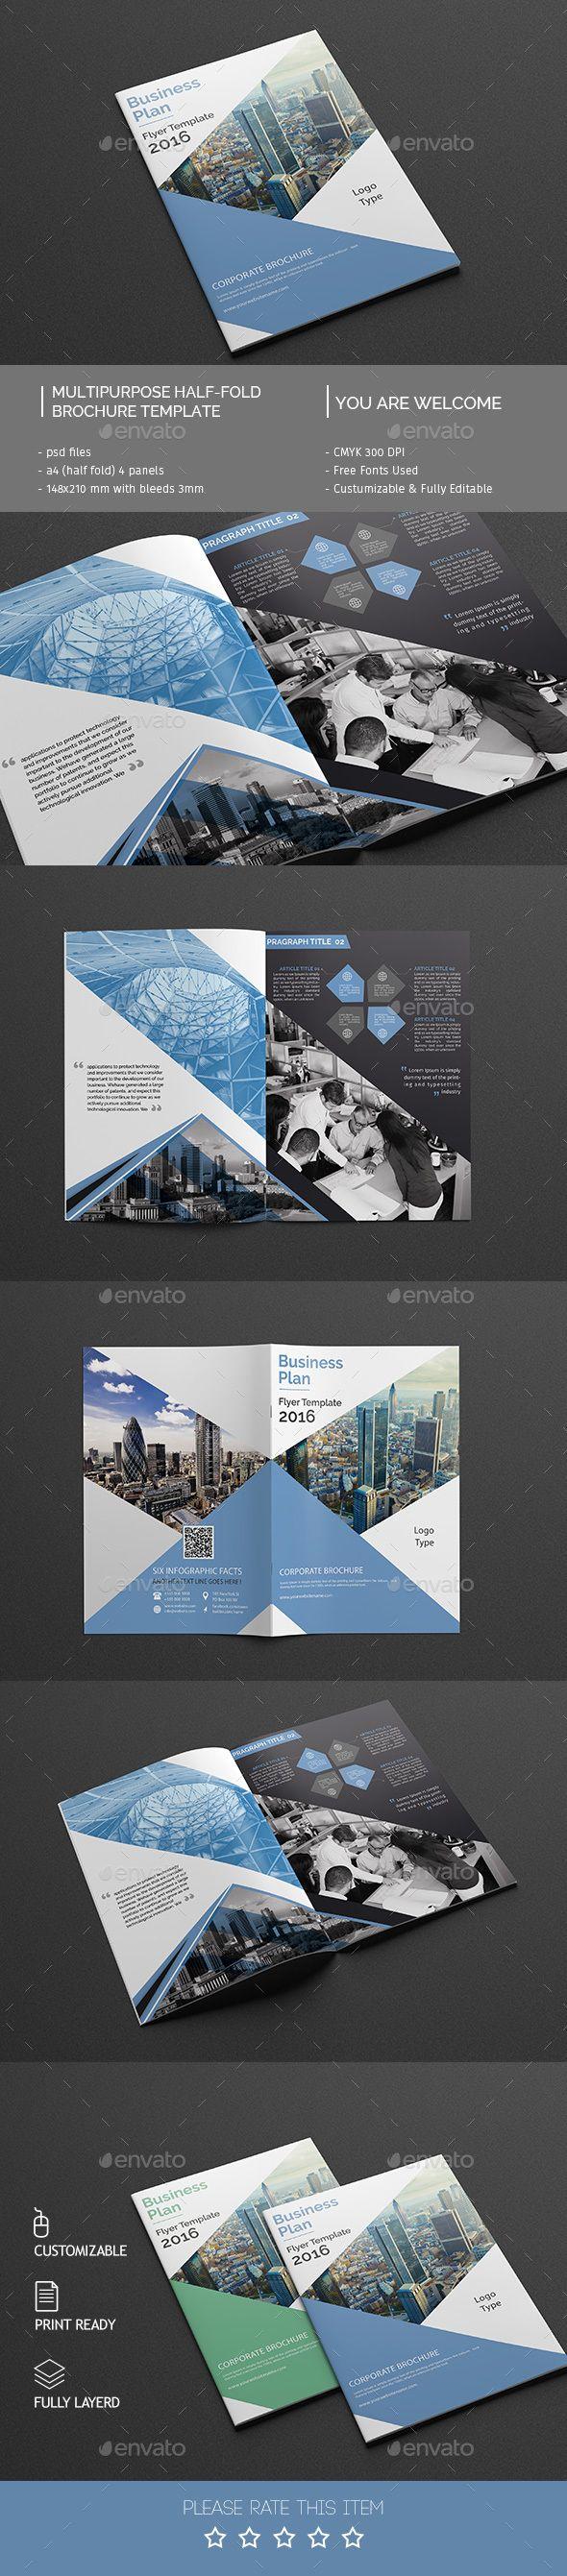 Corporate Bi-fold Brochure Template PSD. Download here: http://graphicriver.net/item/corporate-bifold-brochure-template-03/15210331?ref=ksioks